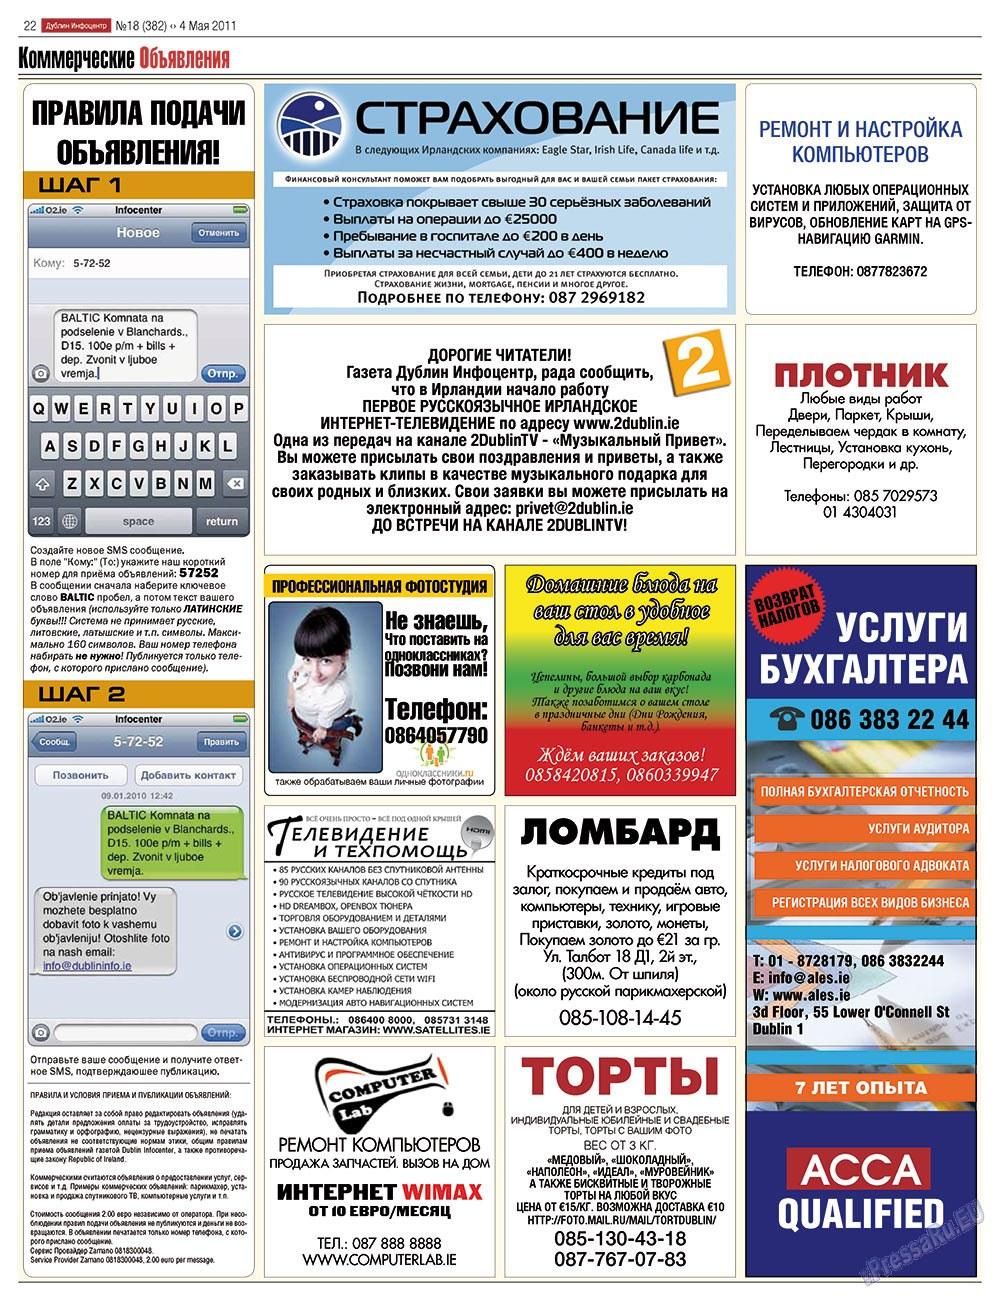 Дублин инфоцентр (газета). 2011 год, номер 18, стр. 22